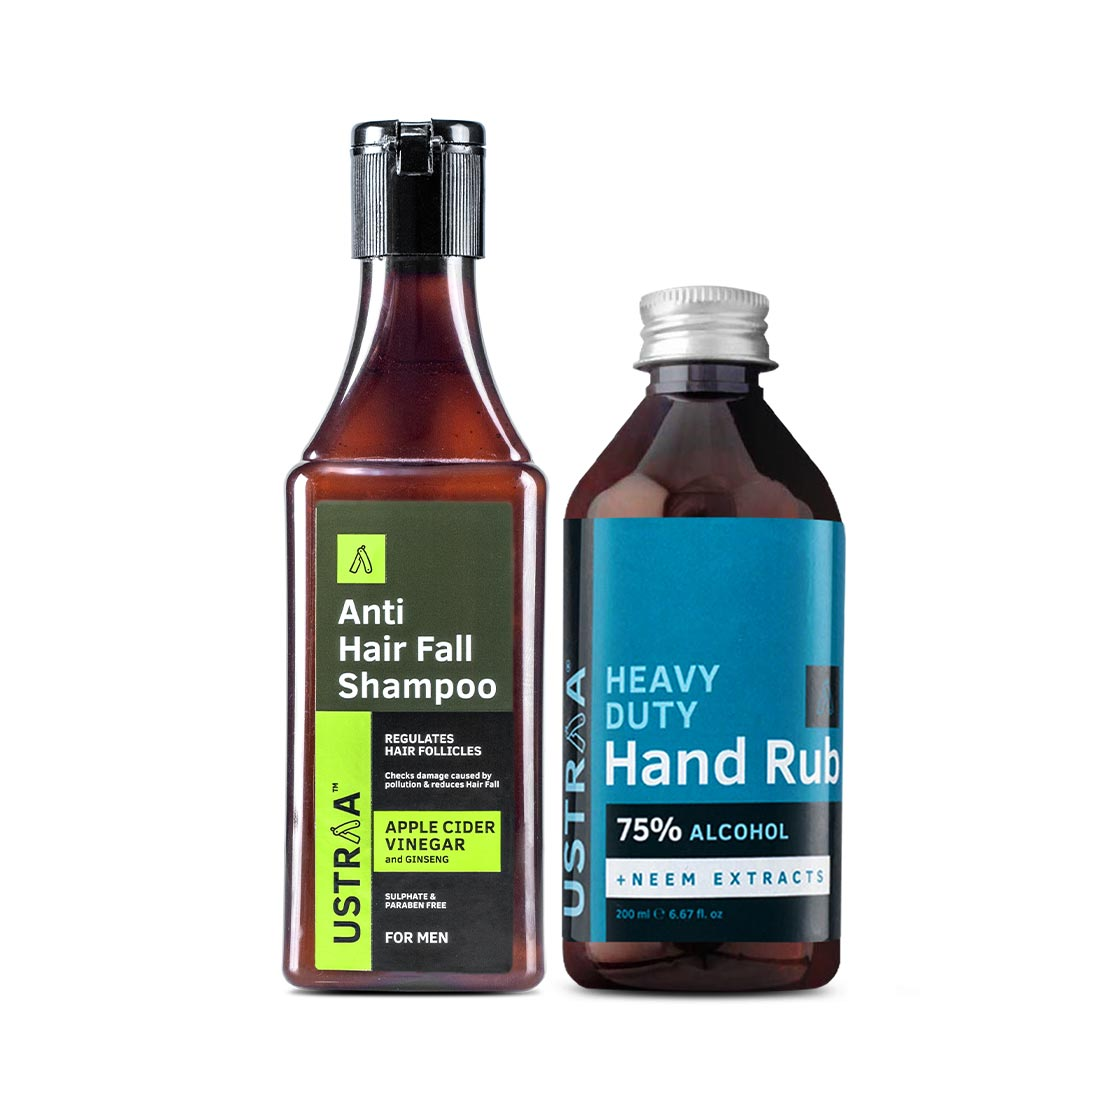 Anti Hairfall Shampoo and Hand Rub - 200 ml